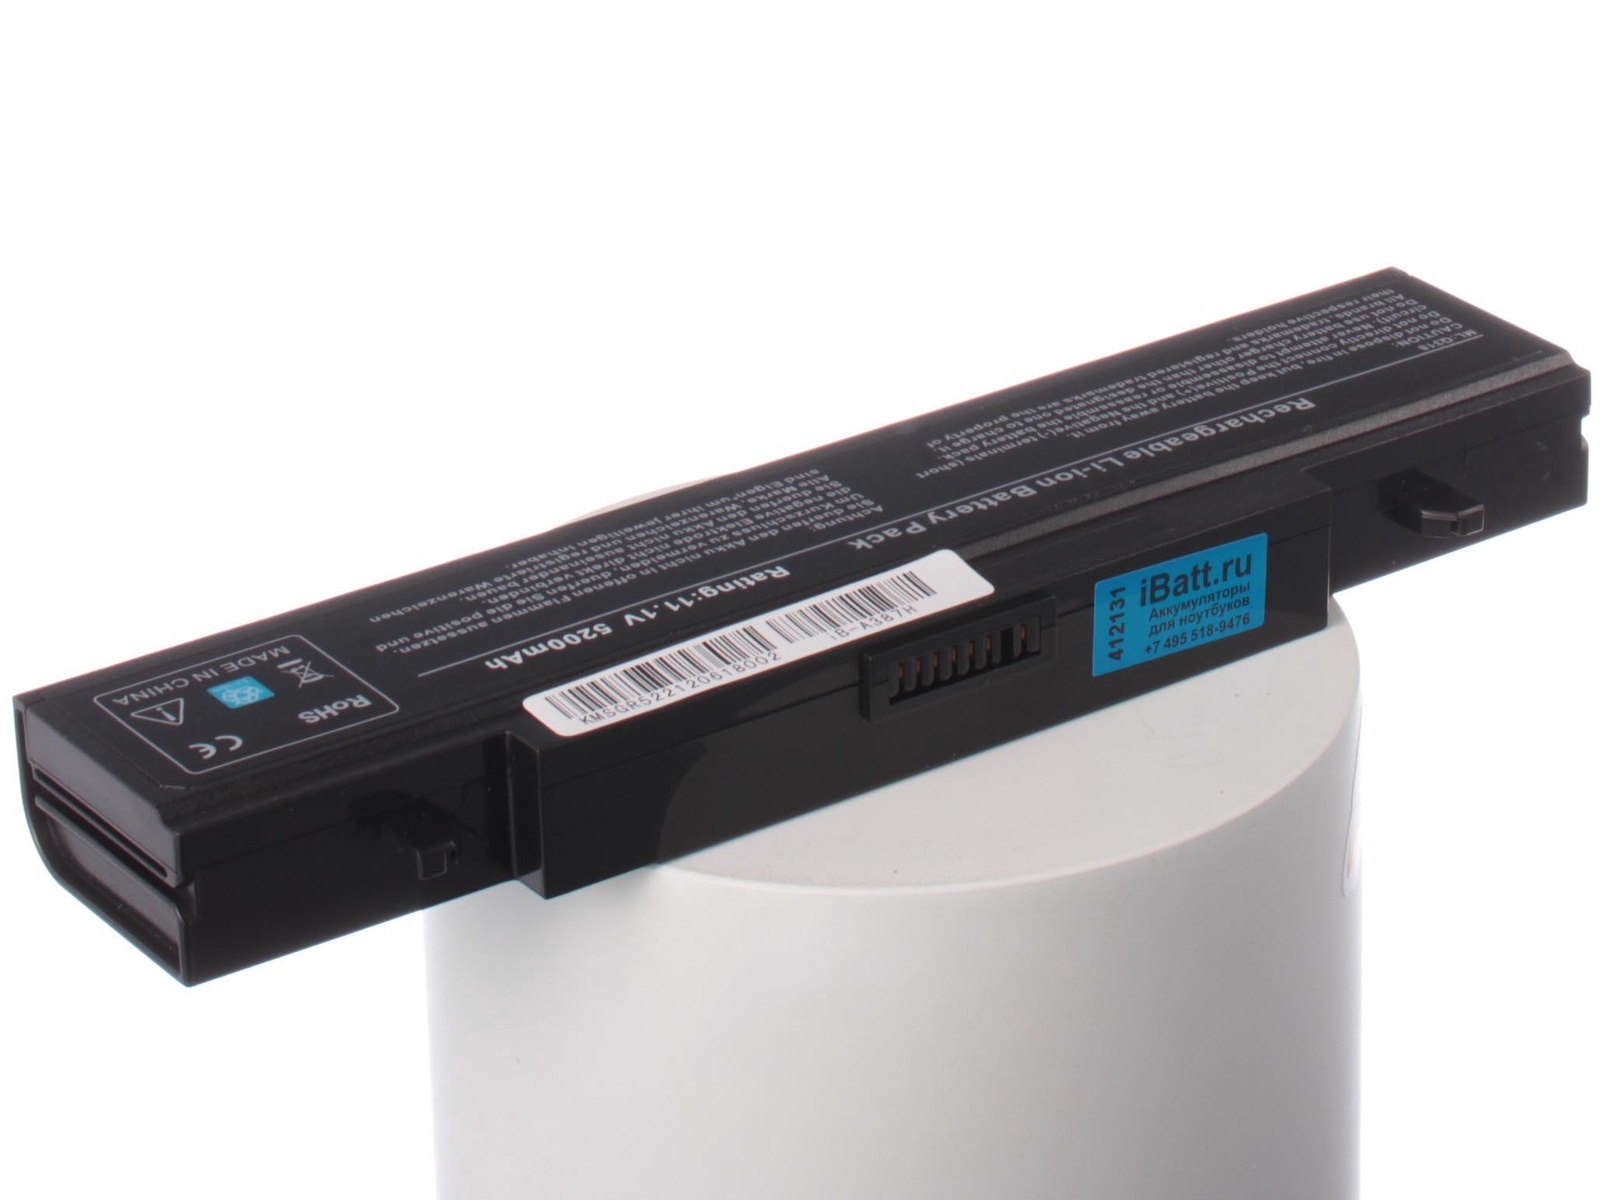 Аккумулятор для ноутбука iBatt для Samsung ATIV Book 2 270E5V, NP-R480, NP-RV410L, R525-JV06, RV520-S0A, RV709, NP270E5E-X05, R540-JS05, RC510-S04, RC530-S09, RF511-S03, RV410-A02, RV520-S08, RV718, 300E5A-S01, 300E7A-S05 аккумулятор для ноутбука anybatt для samsung np q430 rf711 s03 np355v5c a01 rc530 s0b rf511 s05 rv520 s07 rc520 s02 rf511 s01 rf711 s01 rv520 s03 r440 ja04 rc730 s02 rv520 s01 rv520 s0a rv709 np270e5e x05 rc510 s04